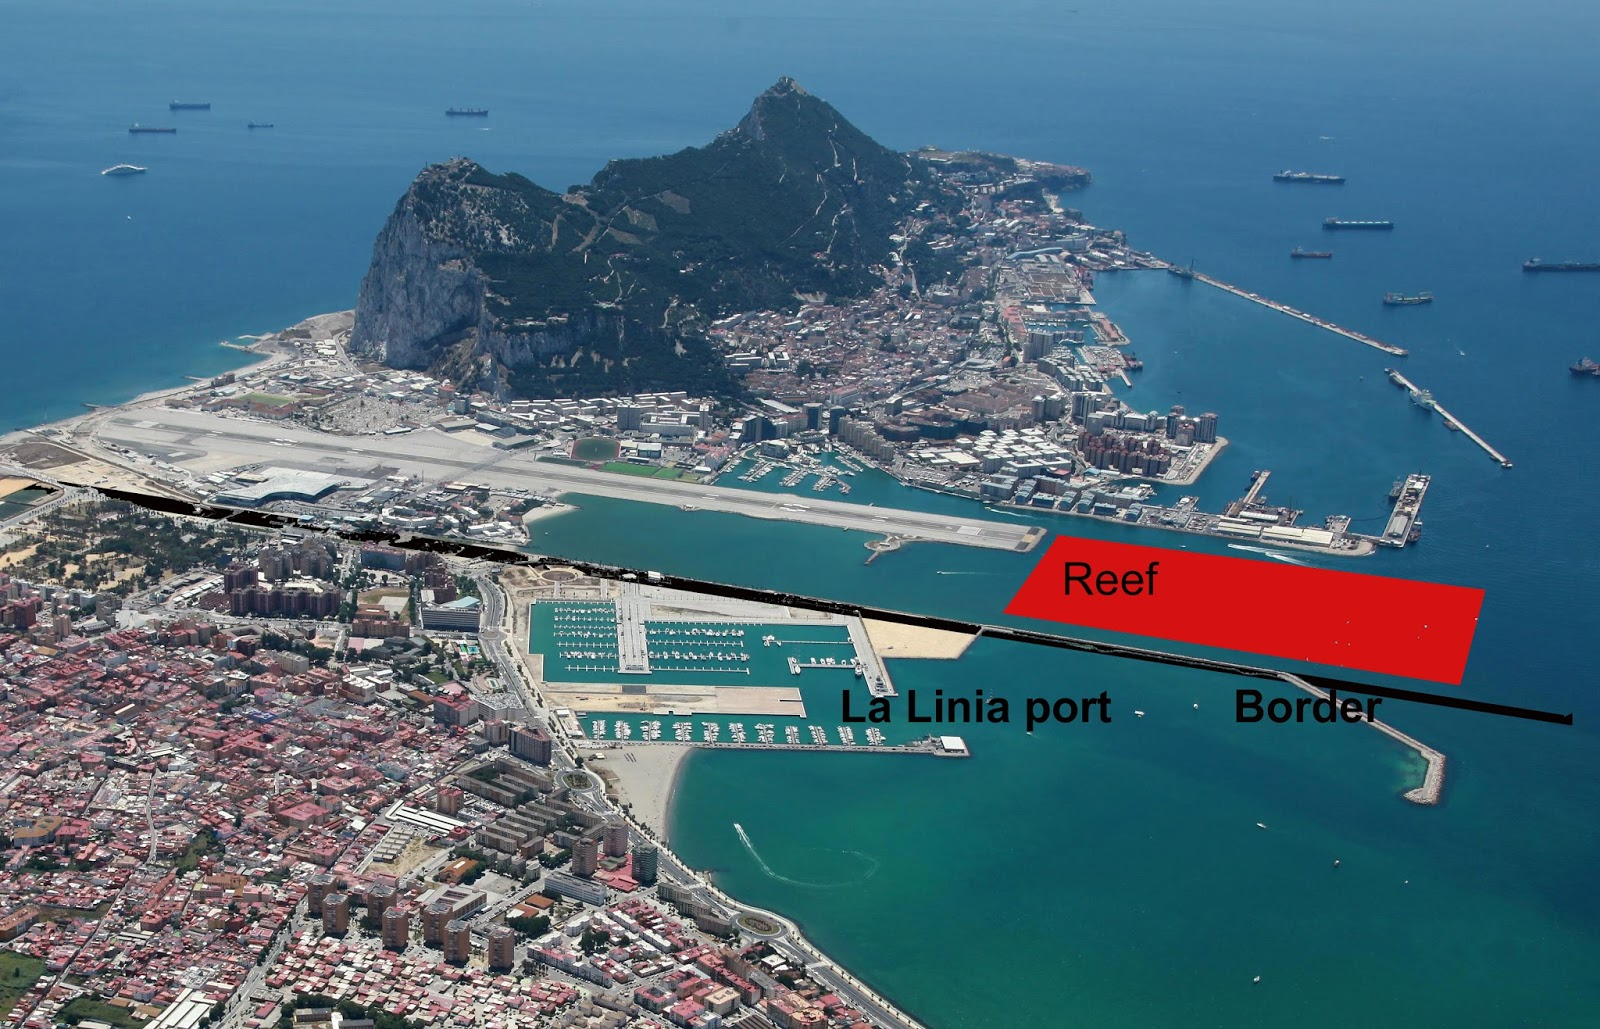 Aerial-view2_zps1b0ca08f.jpg~original